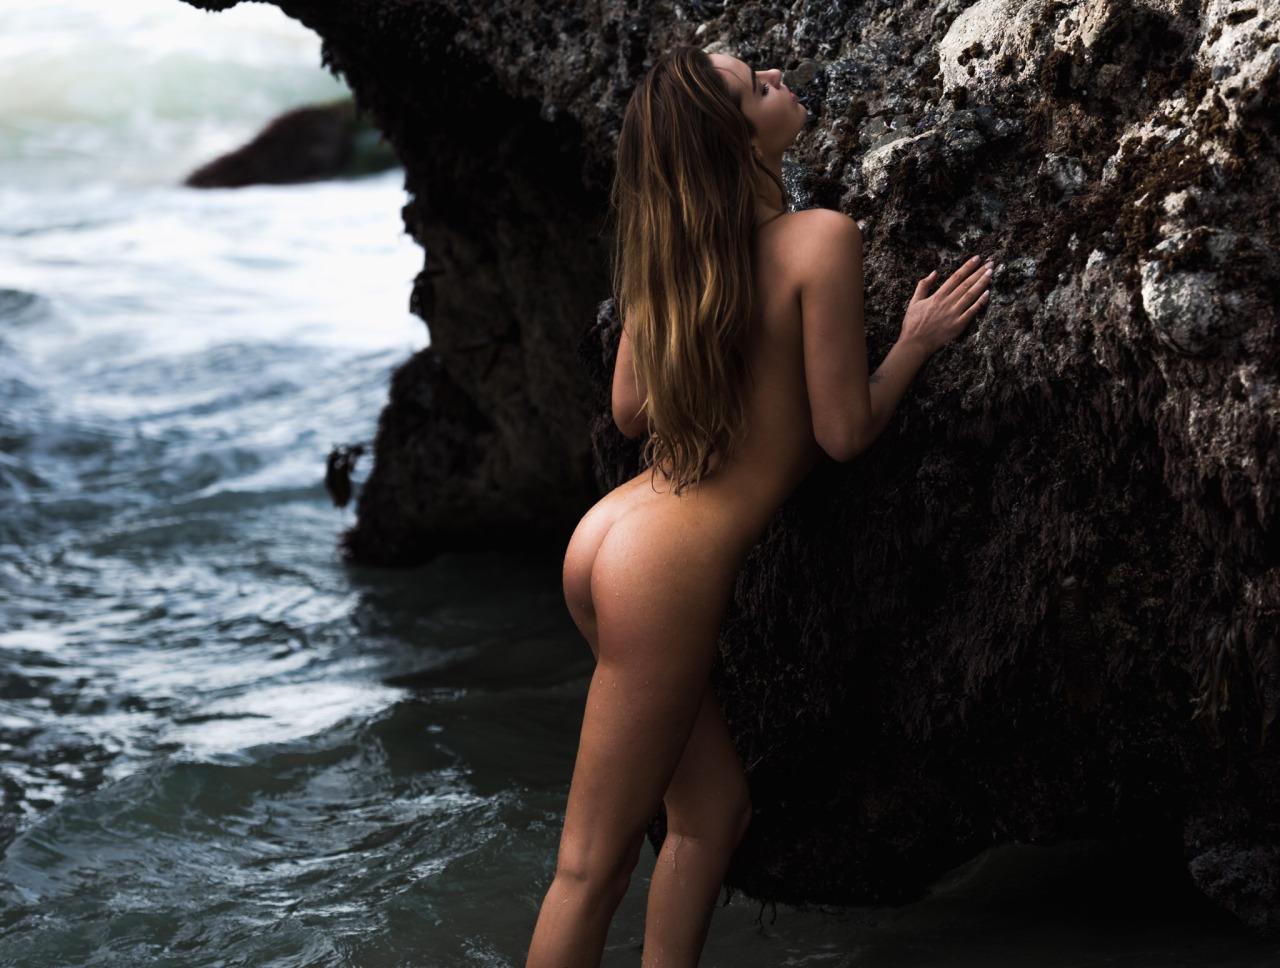 audrey-quock-nude-image-watching-her-xxx